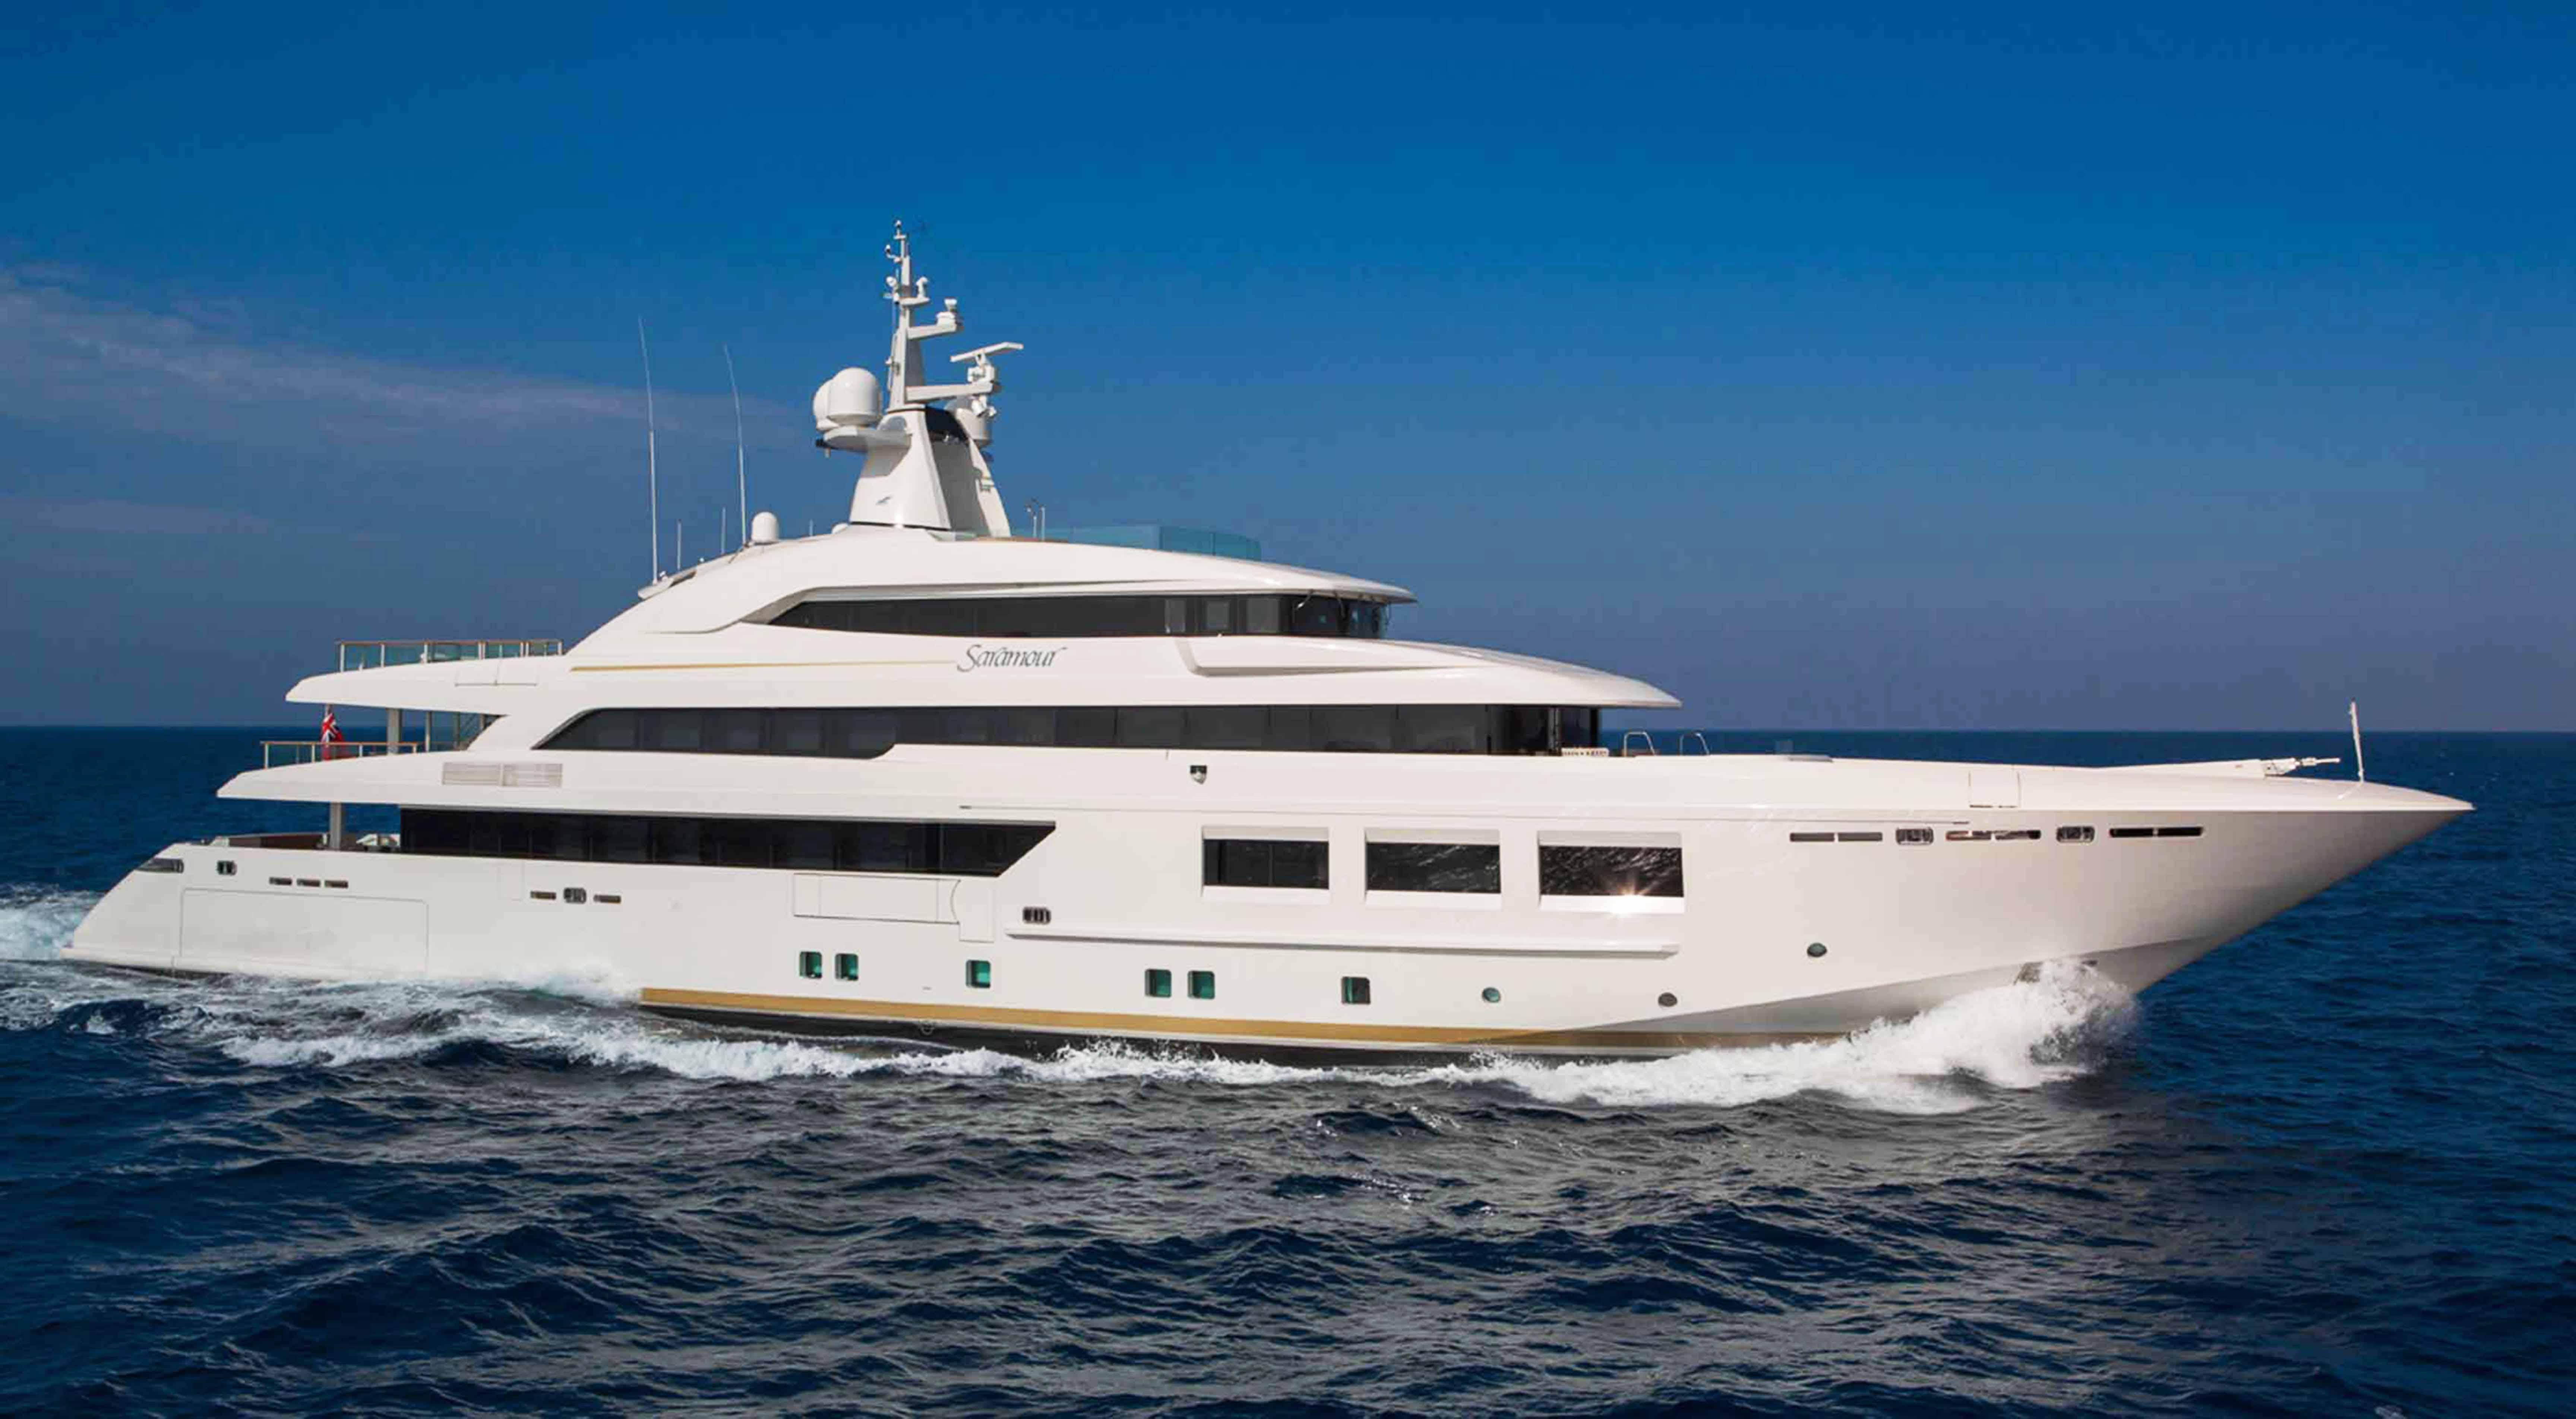 crn - SARAMOUR - Paskowsky Yacht Design